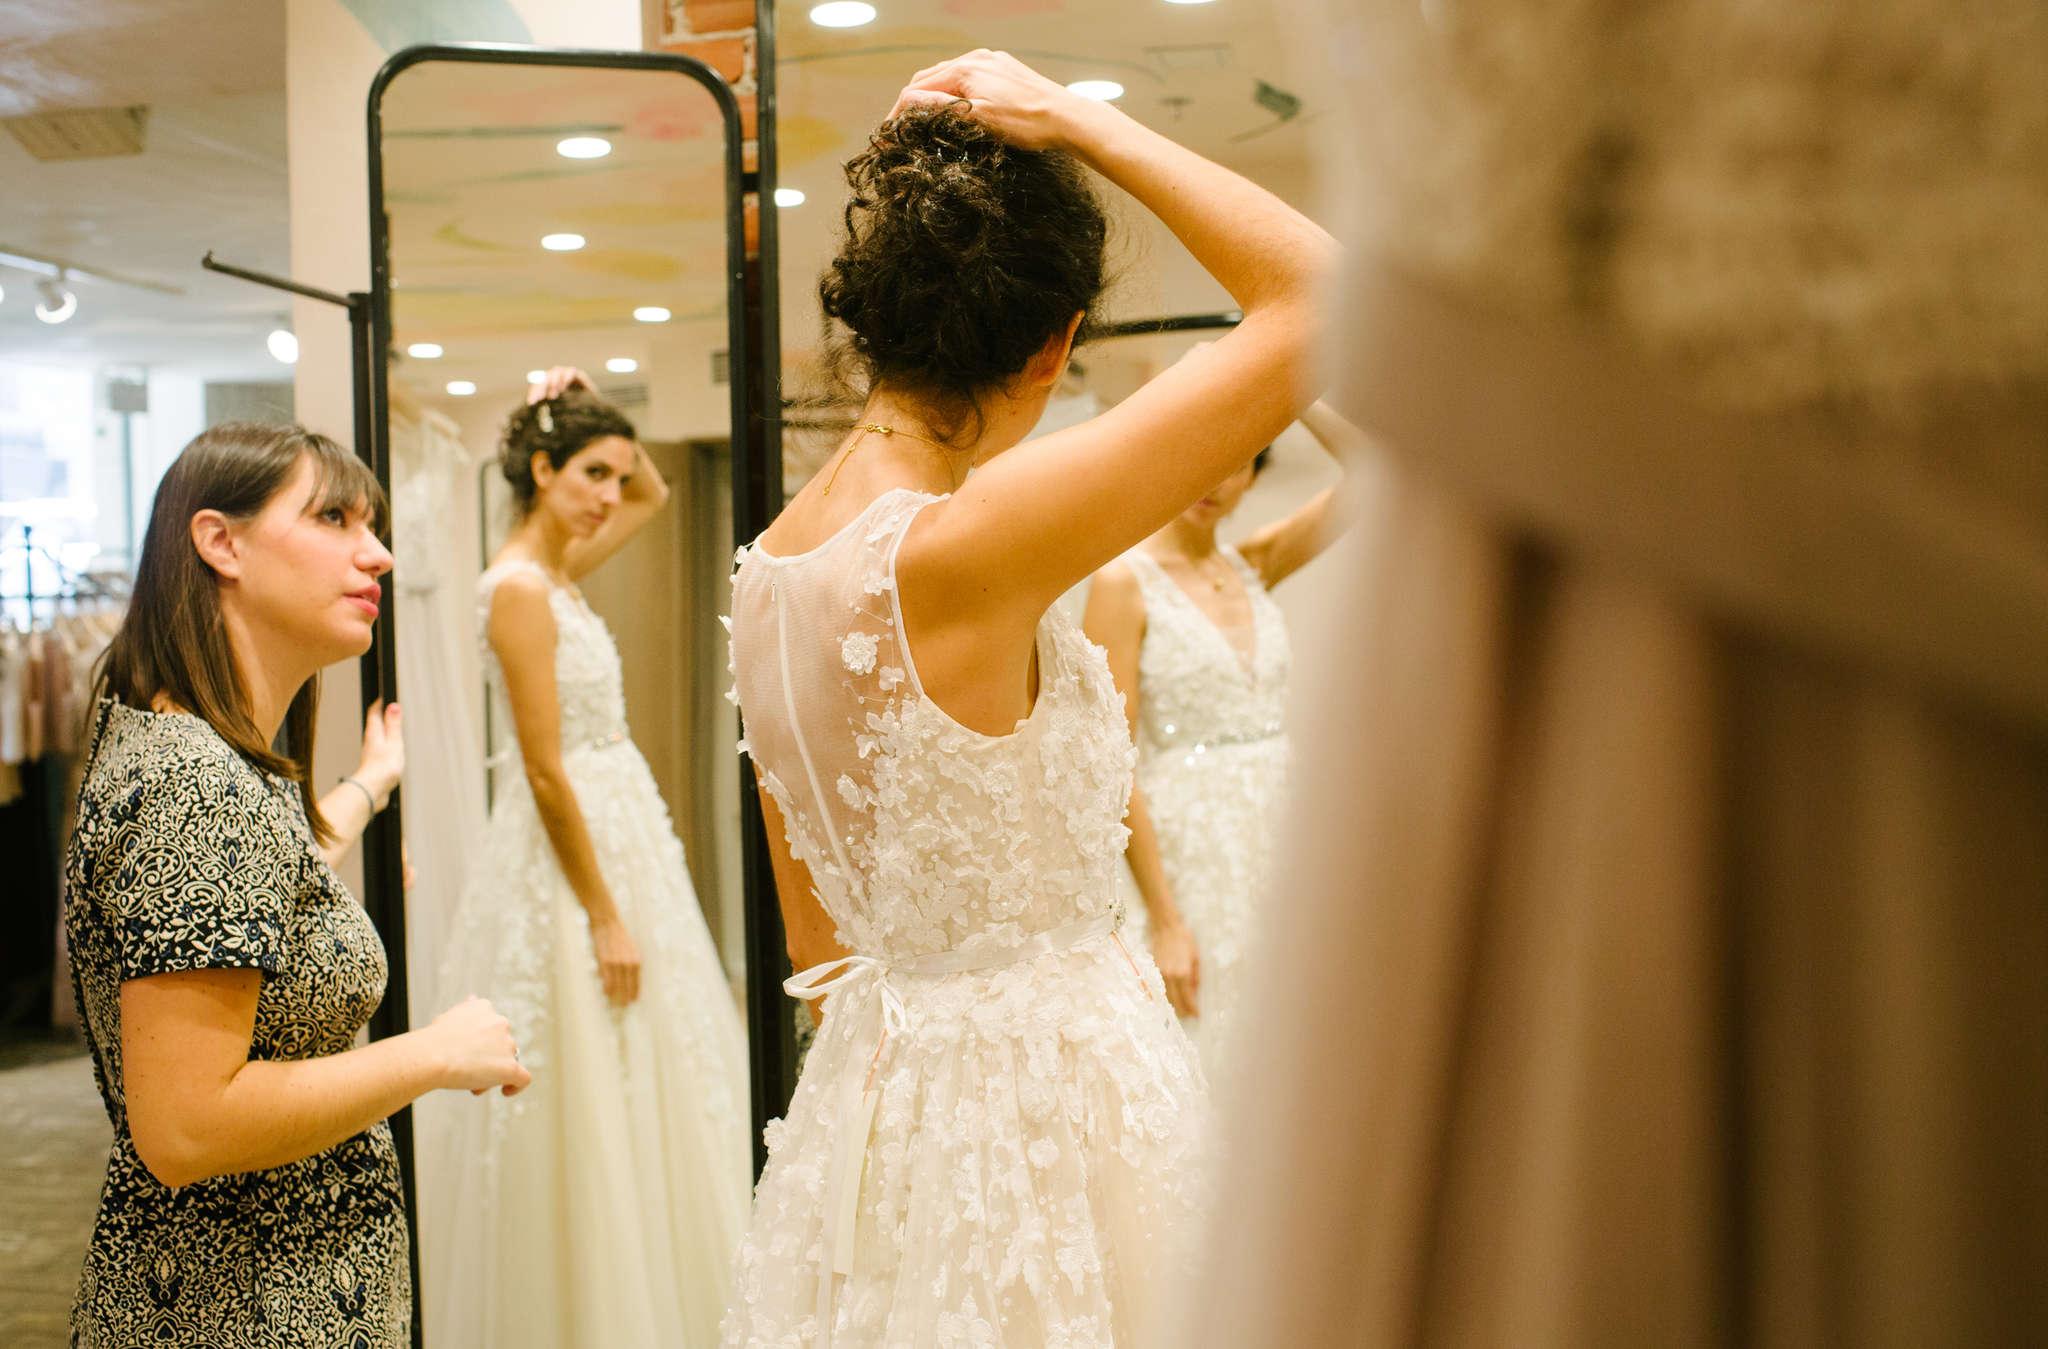 Stylist Beth Rosella helps Ignacia Behncke try on a wedding dress in a new BHLDN location inside a Center City Anthropologie store.